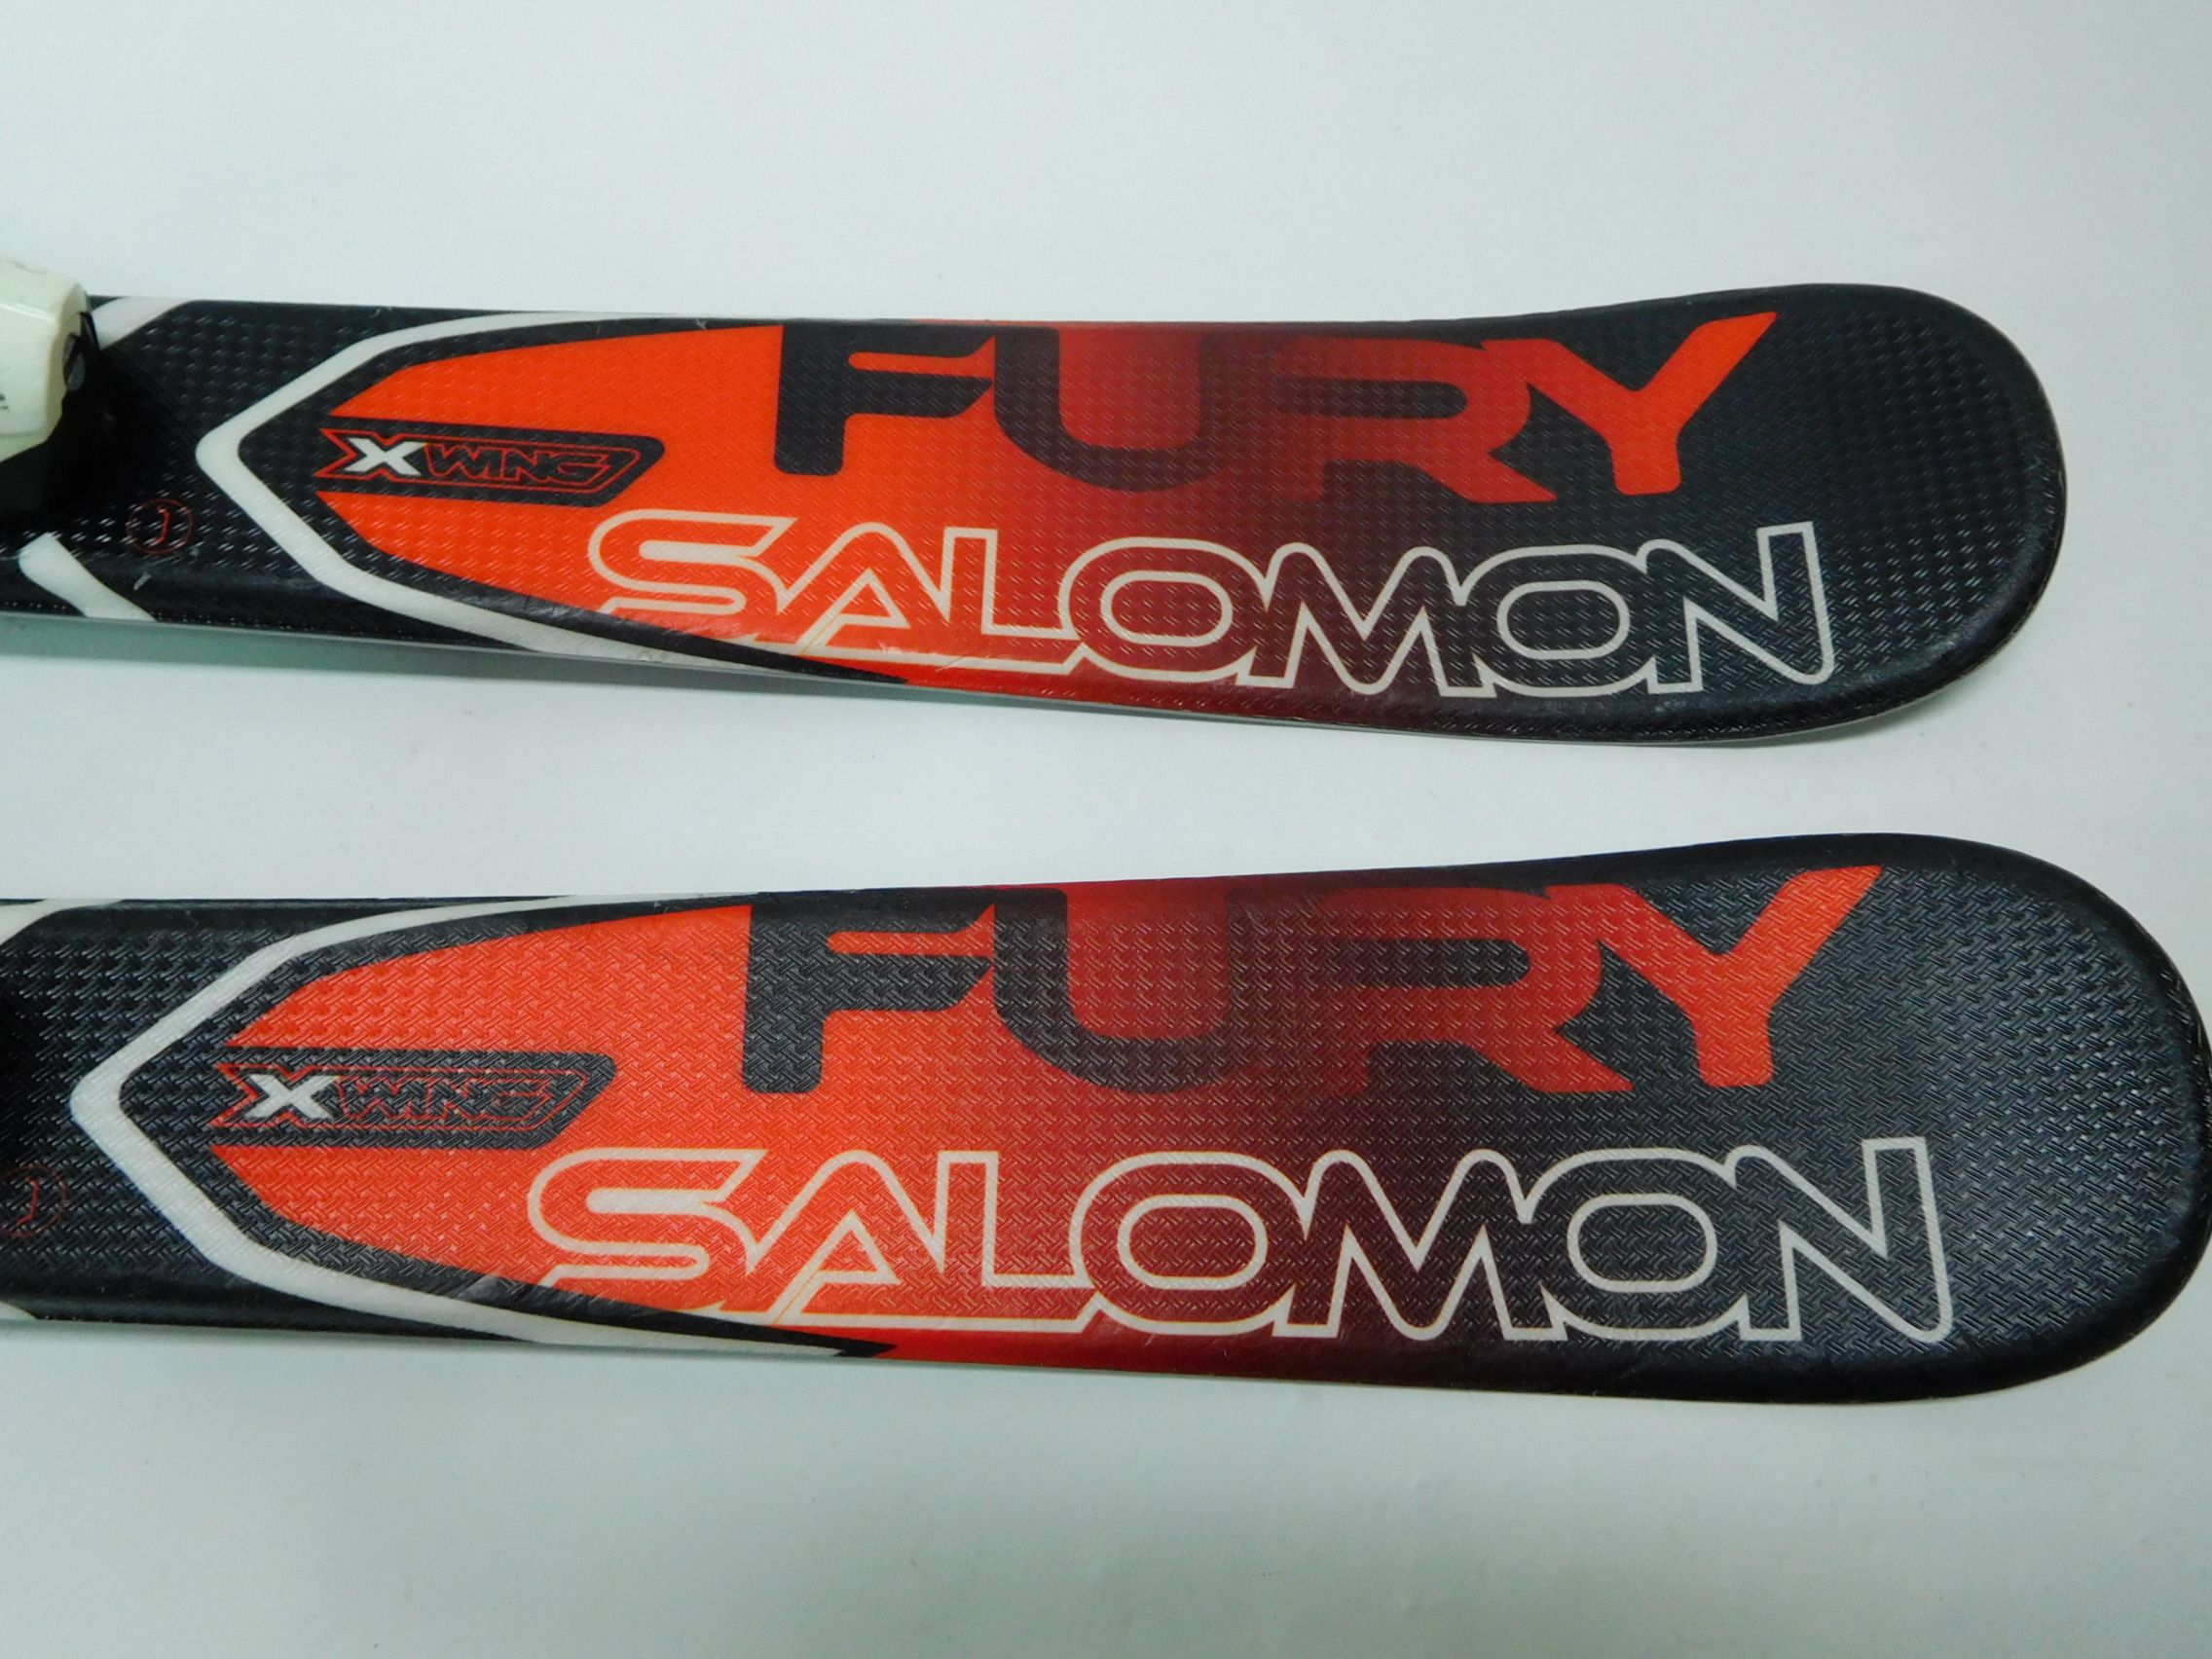 Narty SALOMON X-WING FURY  90cm